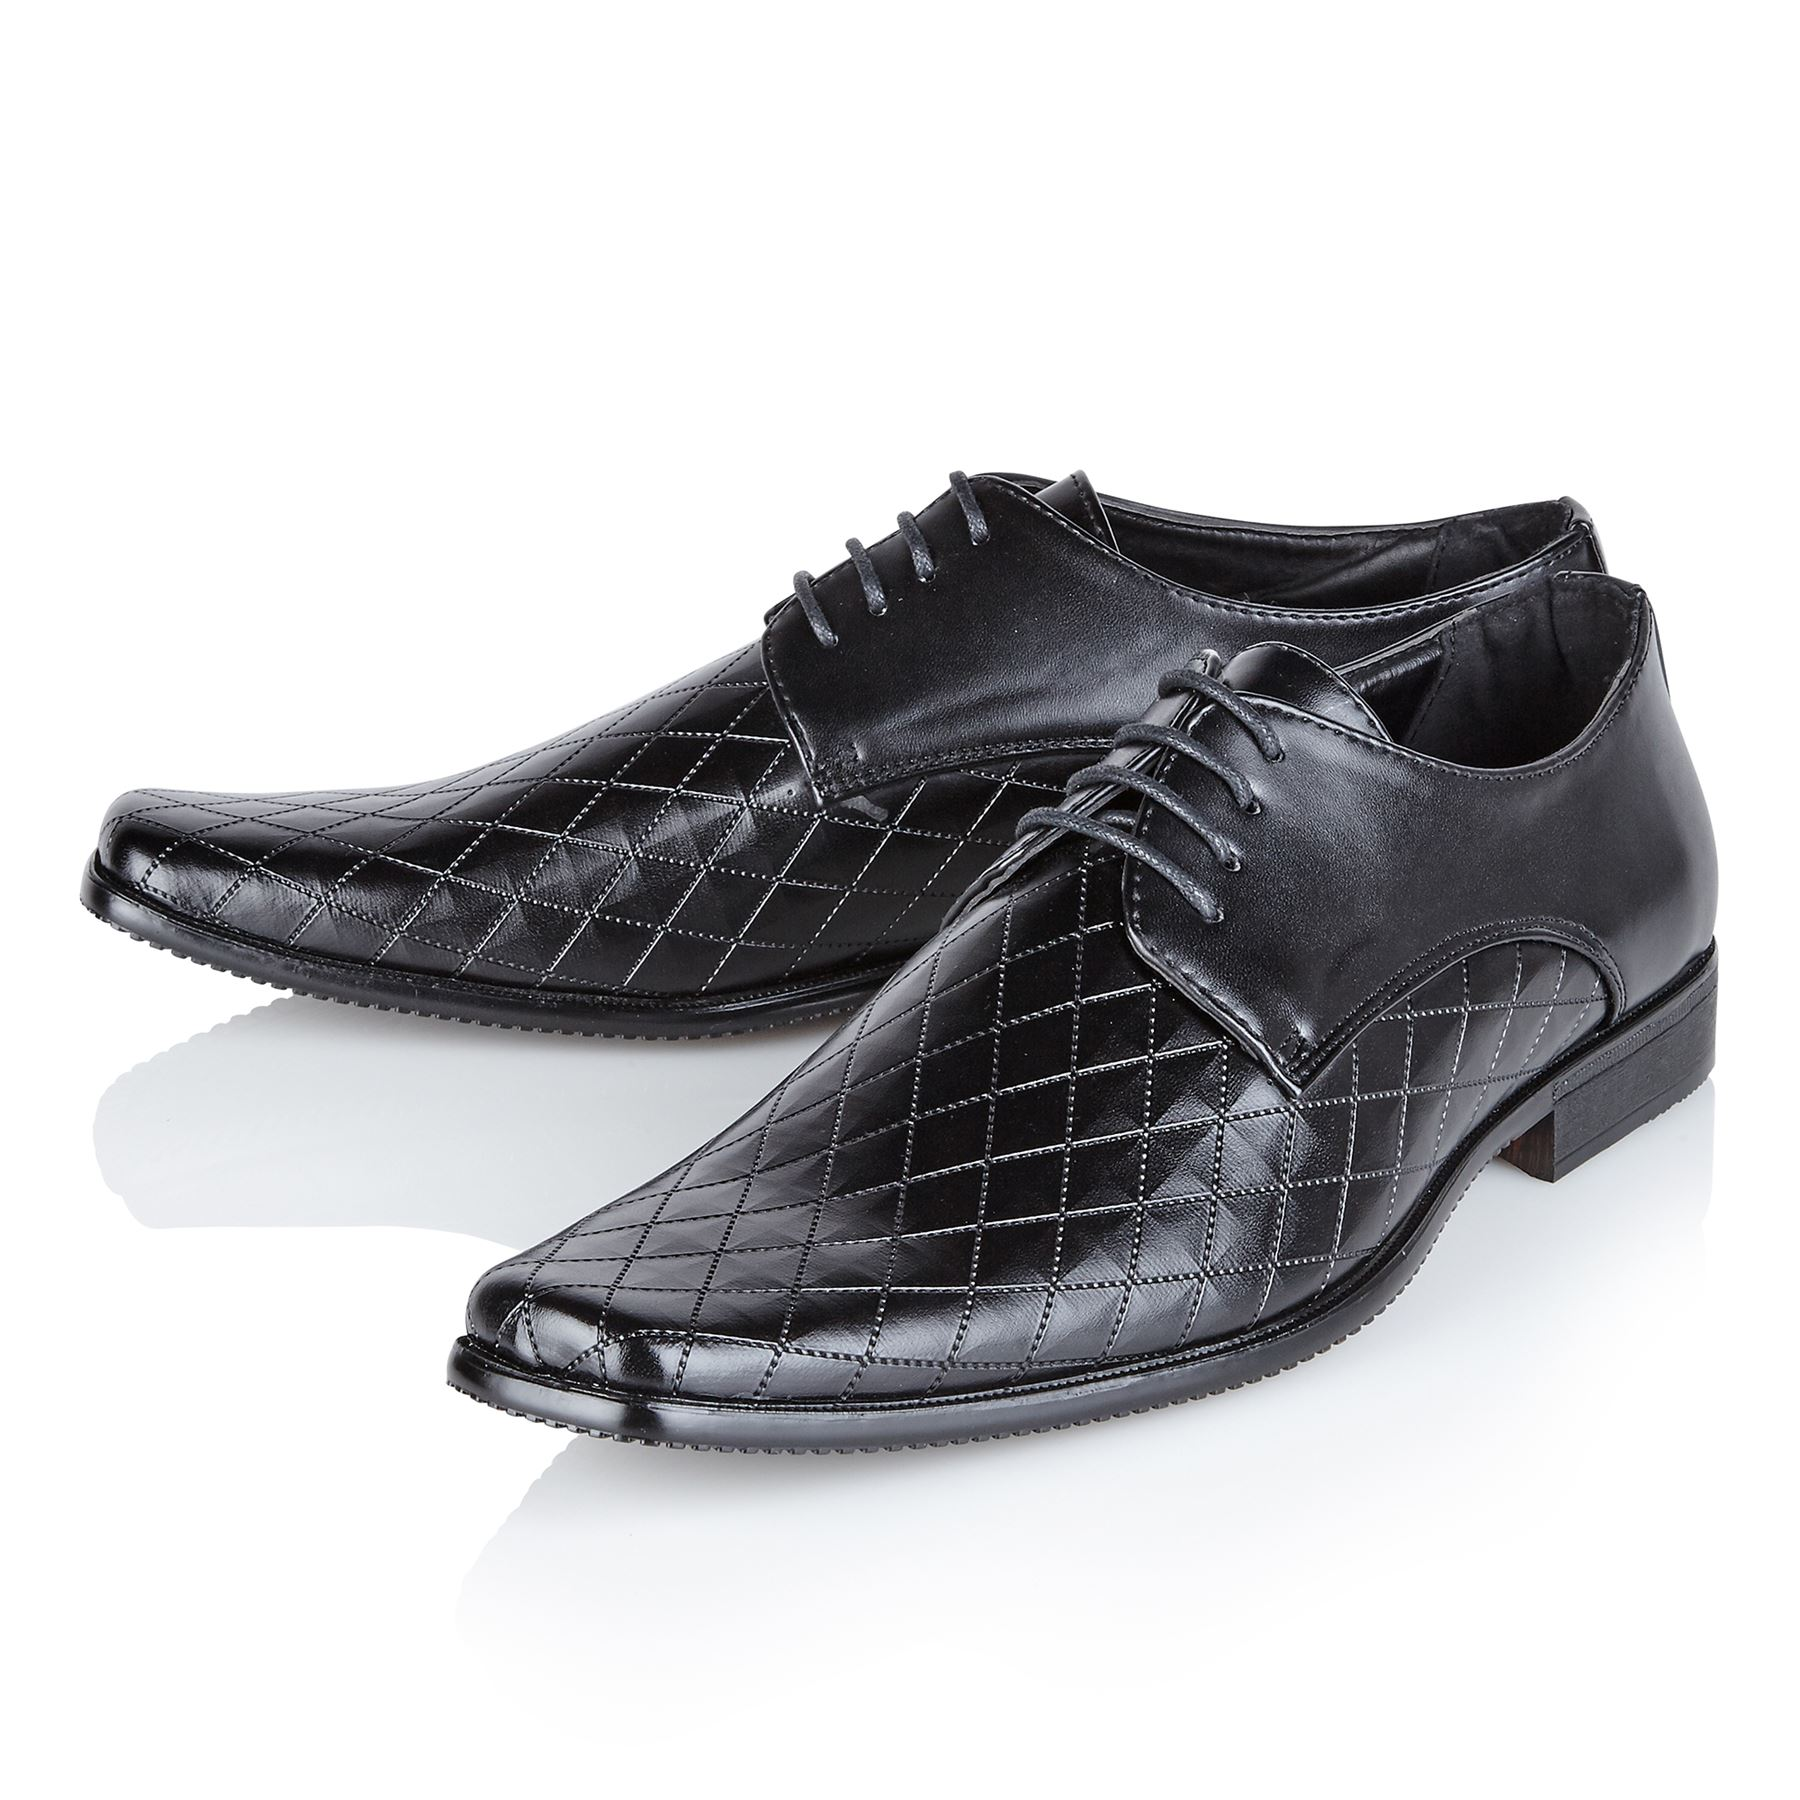 mens wedding shoes casual dress smart italian formal